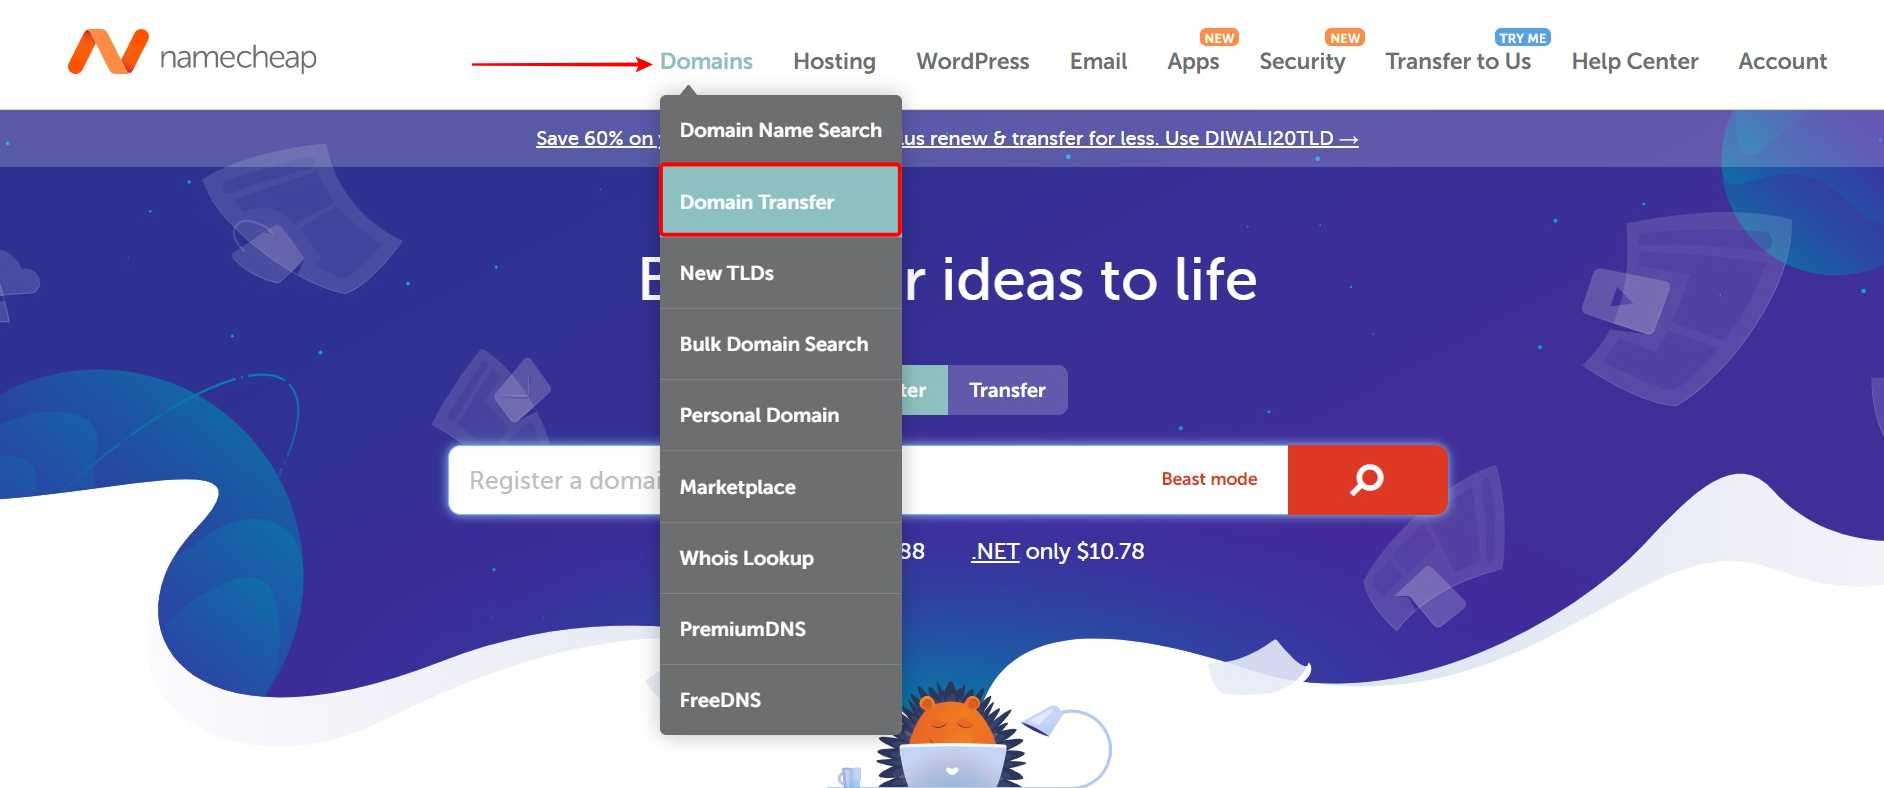 Go toNamecheap.com> Domains > Domain Transfer